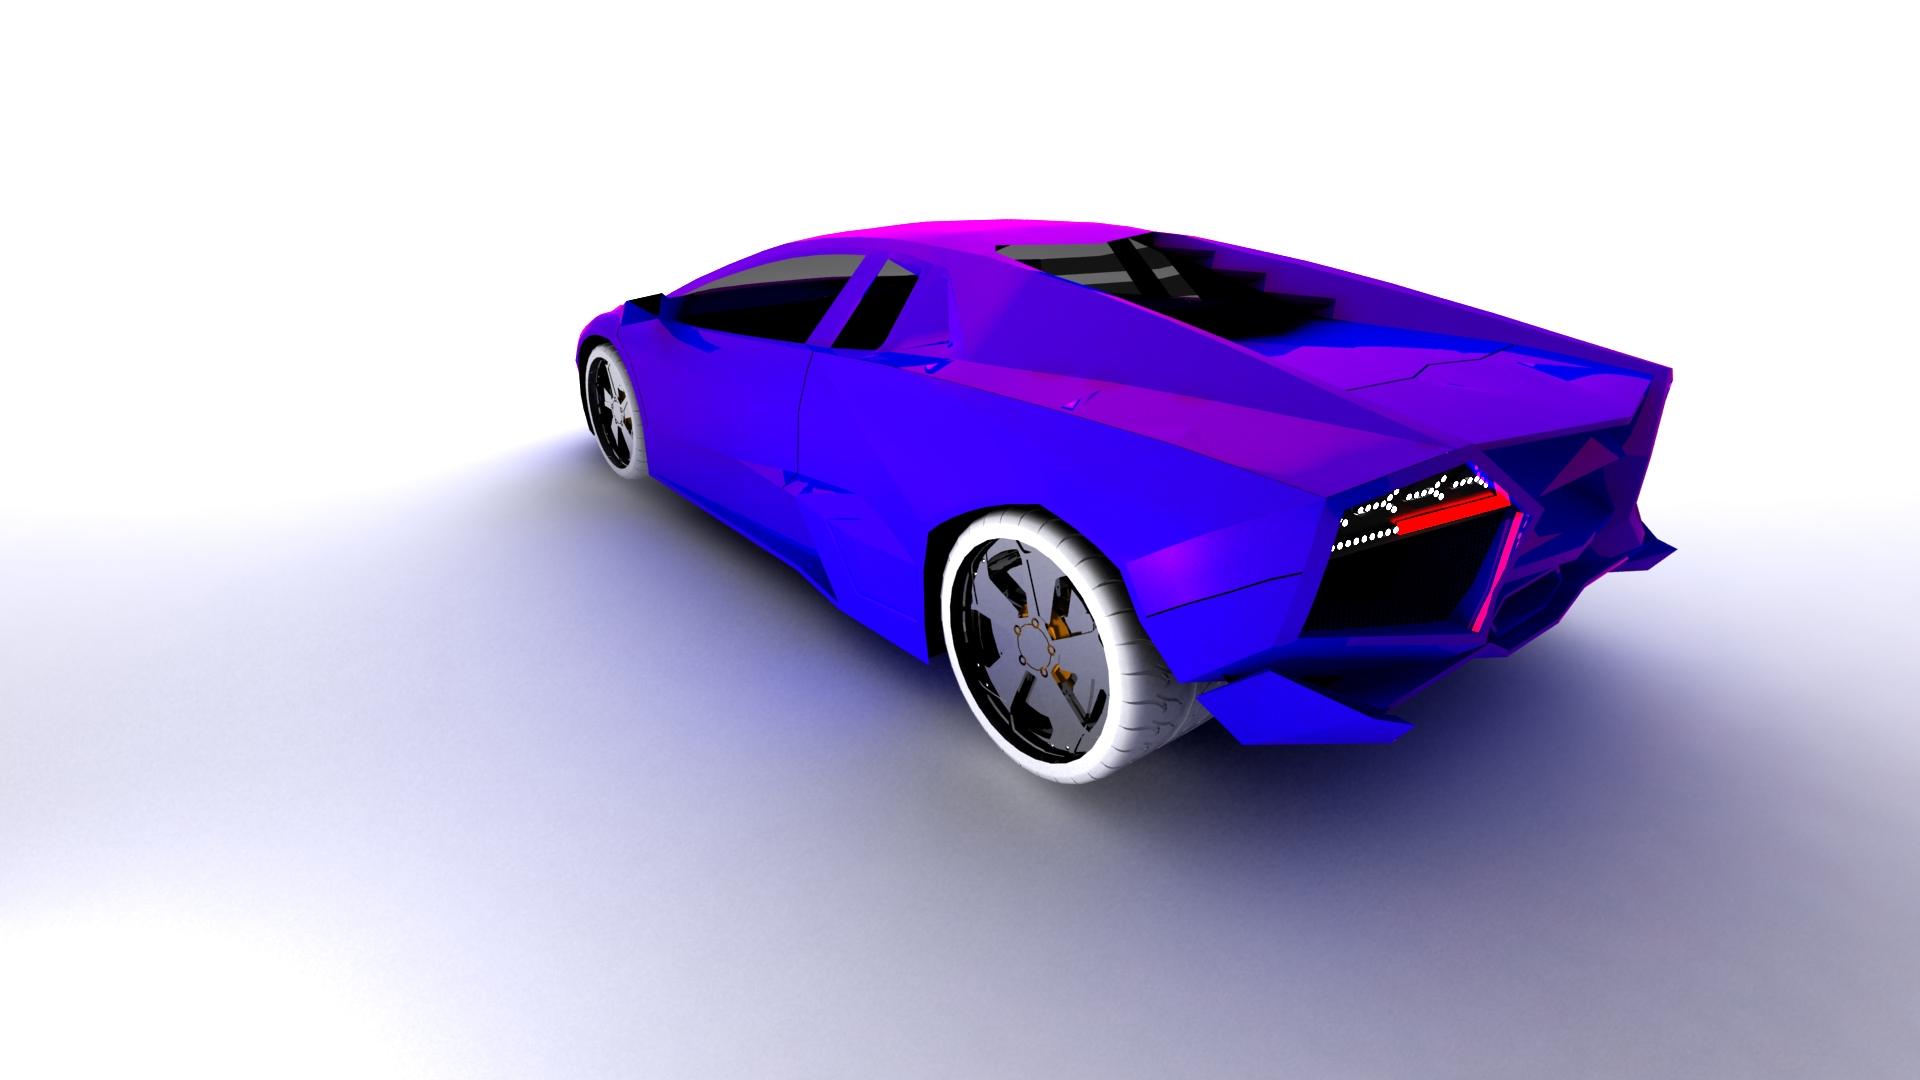 2011.03.08 Lamborghini 3DS MAX + VRAY by TomasMascinskas